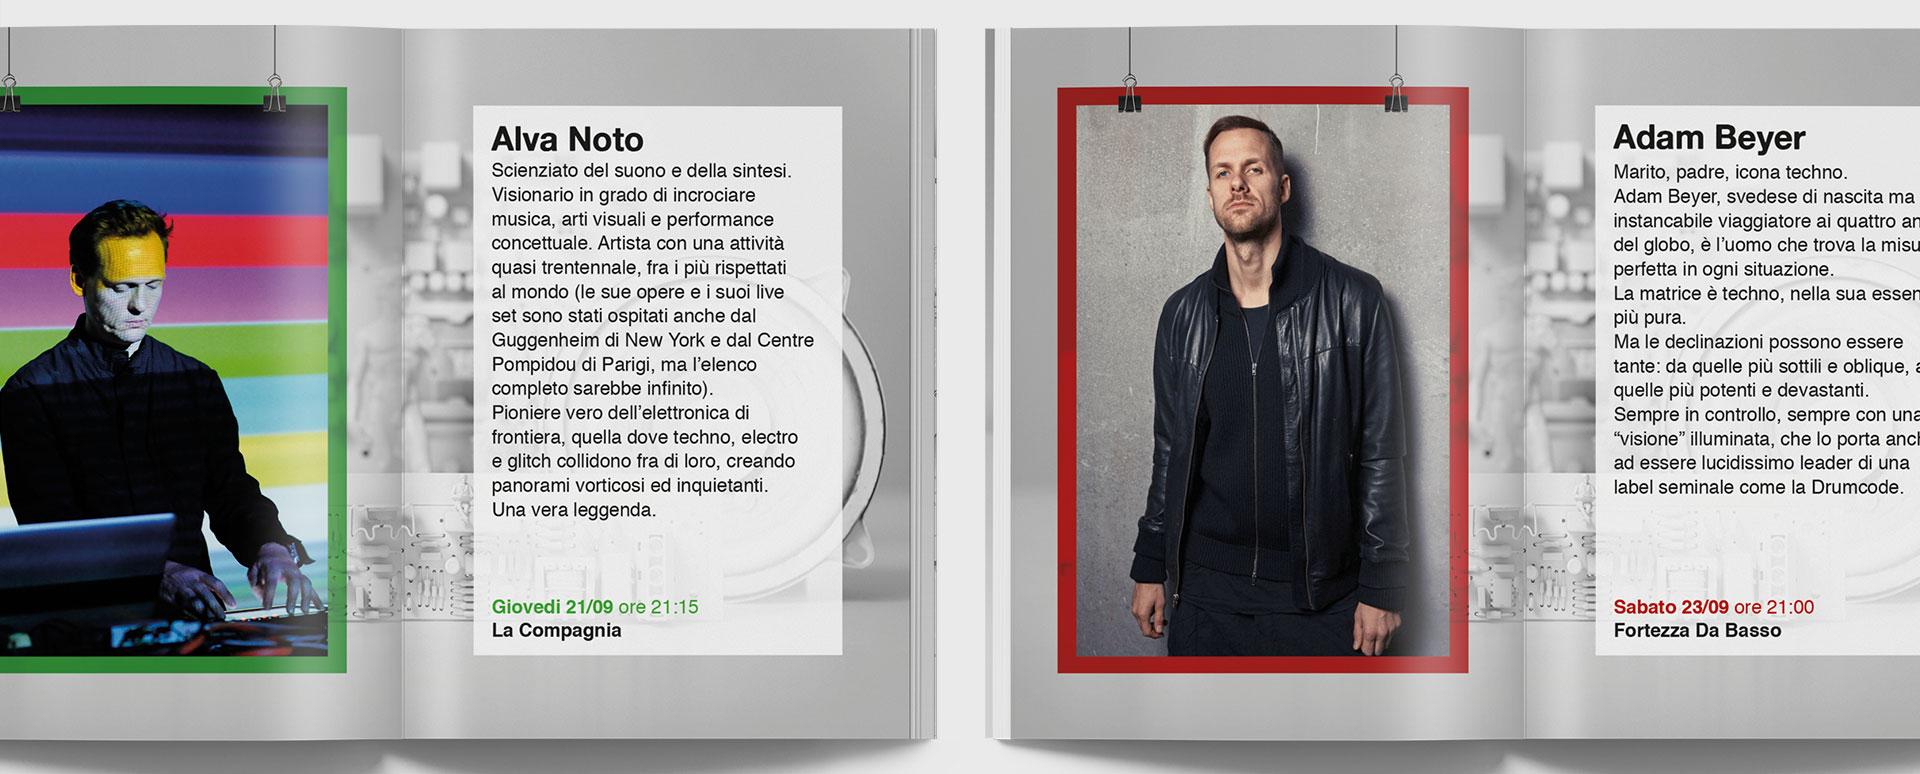 Nextech-Festival-2017-booklet2